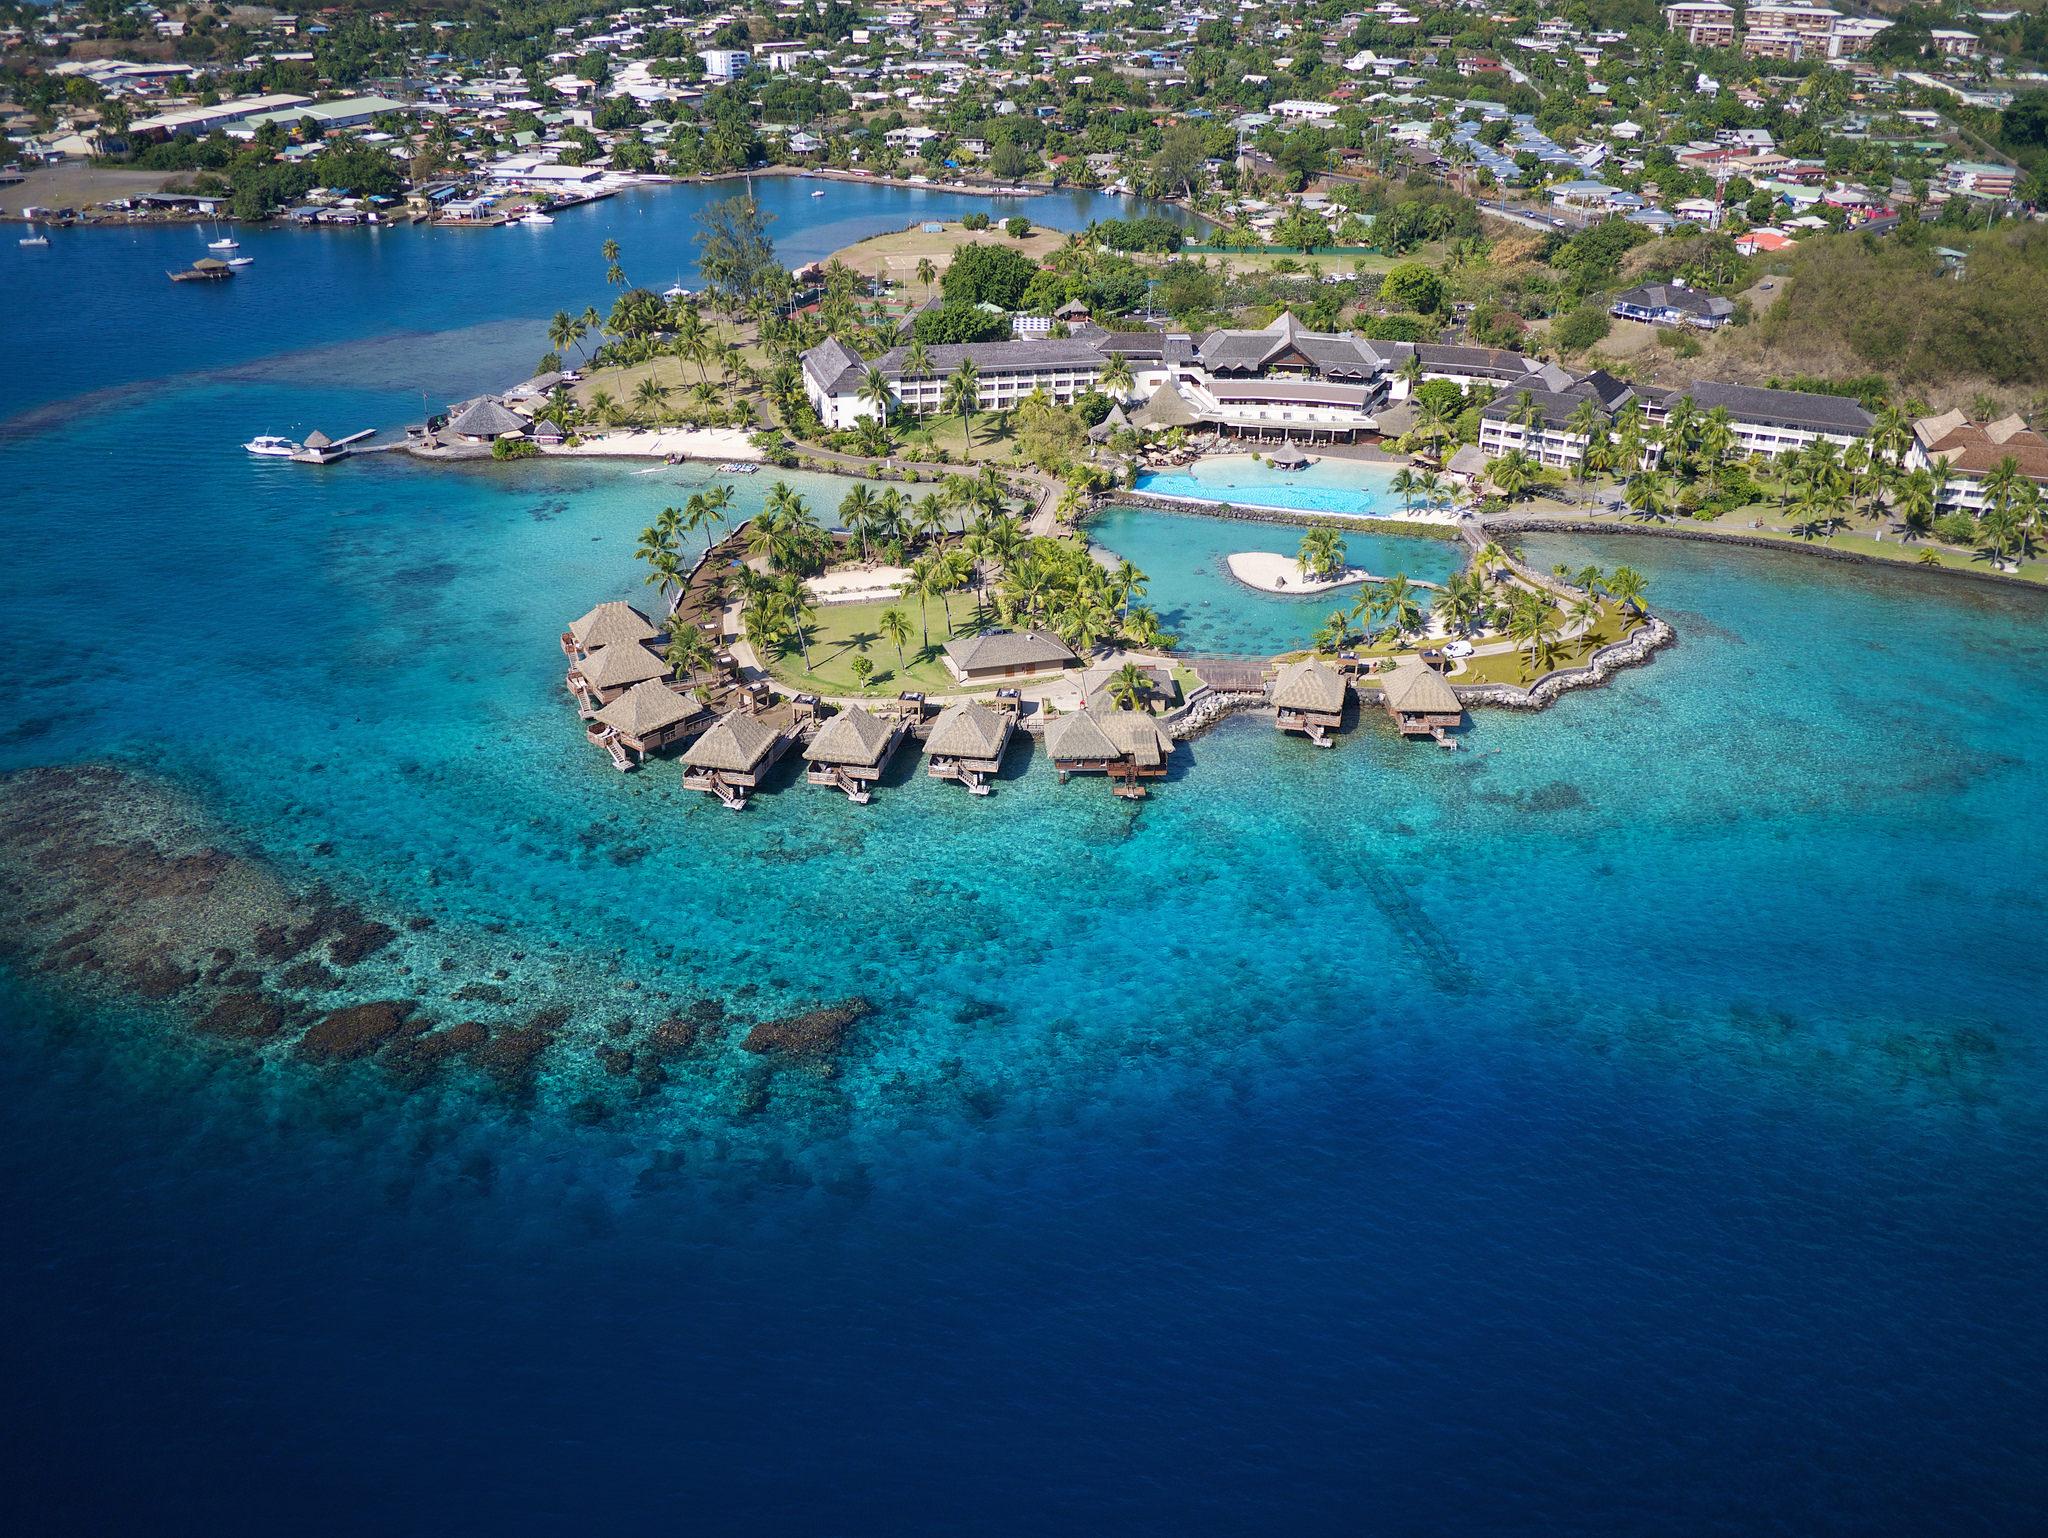 https://tahititourisme.com/wp-content/uploads/2018/07/2015-aerial.jpg